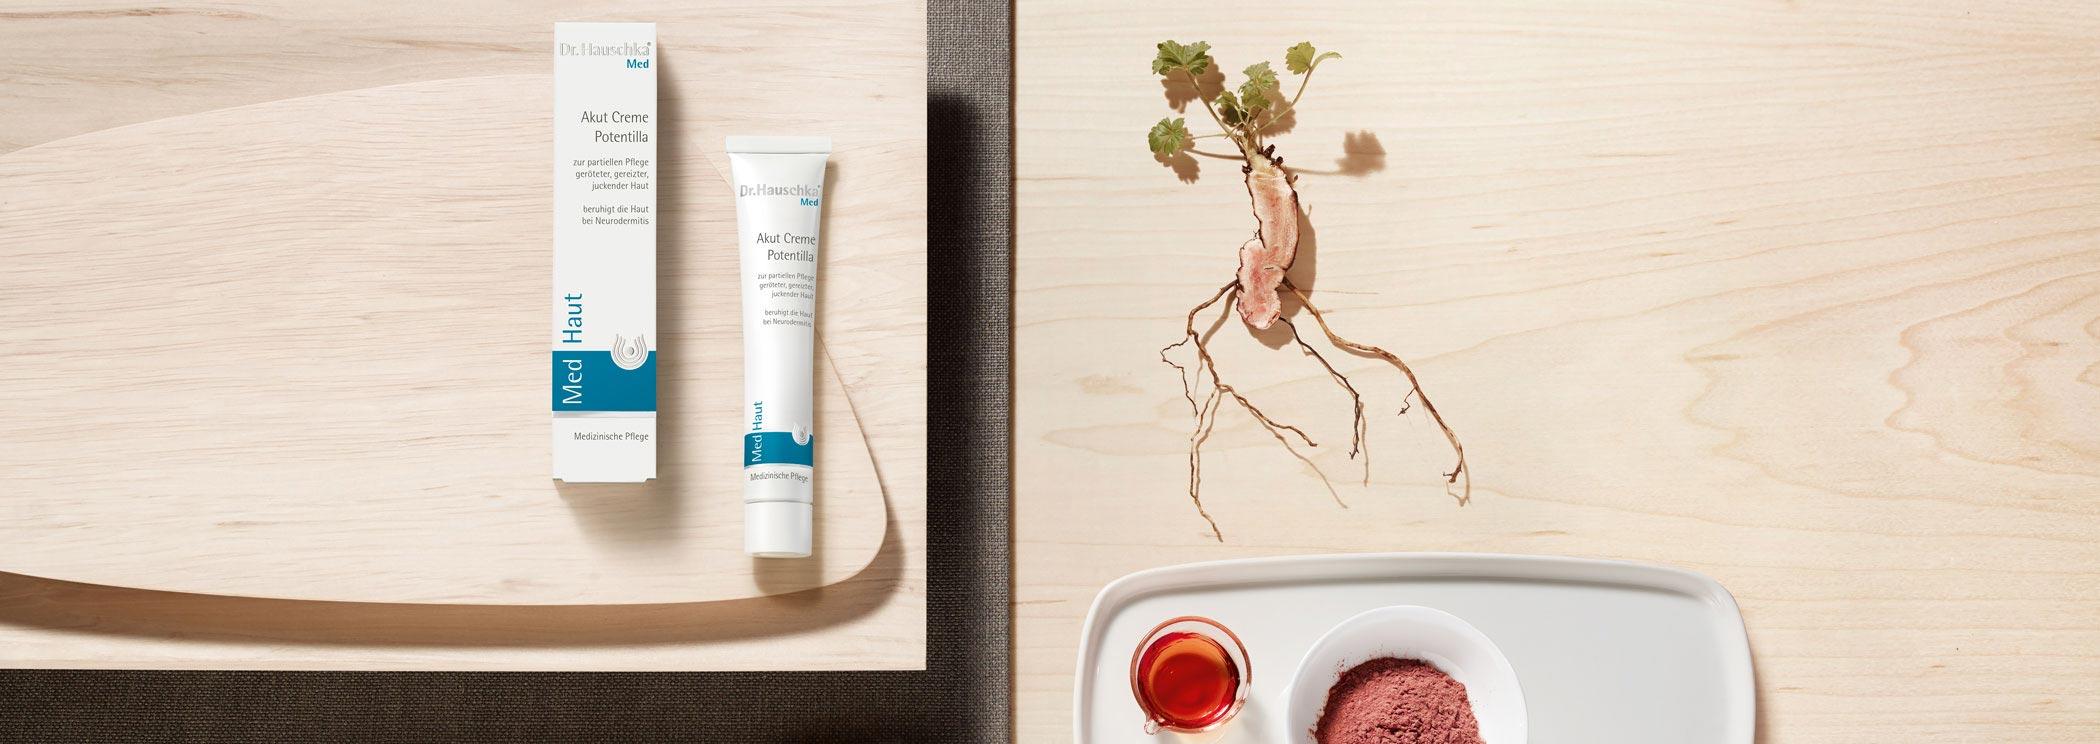 naturkosmetik zur pflege f r gesicht k rper dr. Black Bedroom Furniture Sets. Home Design Ideas